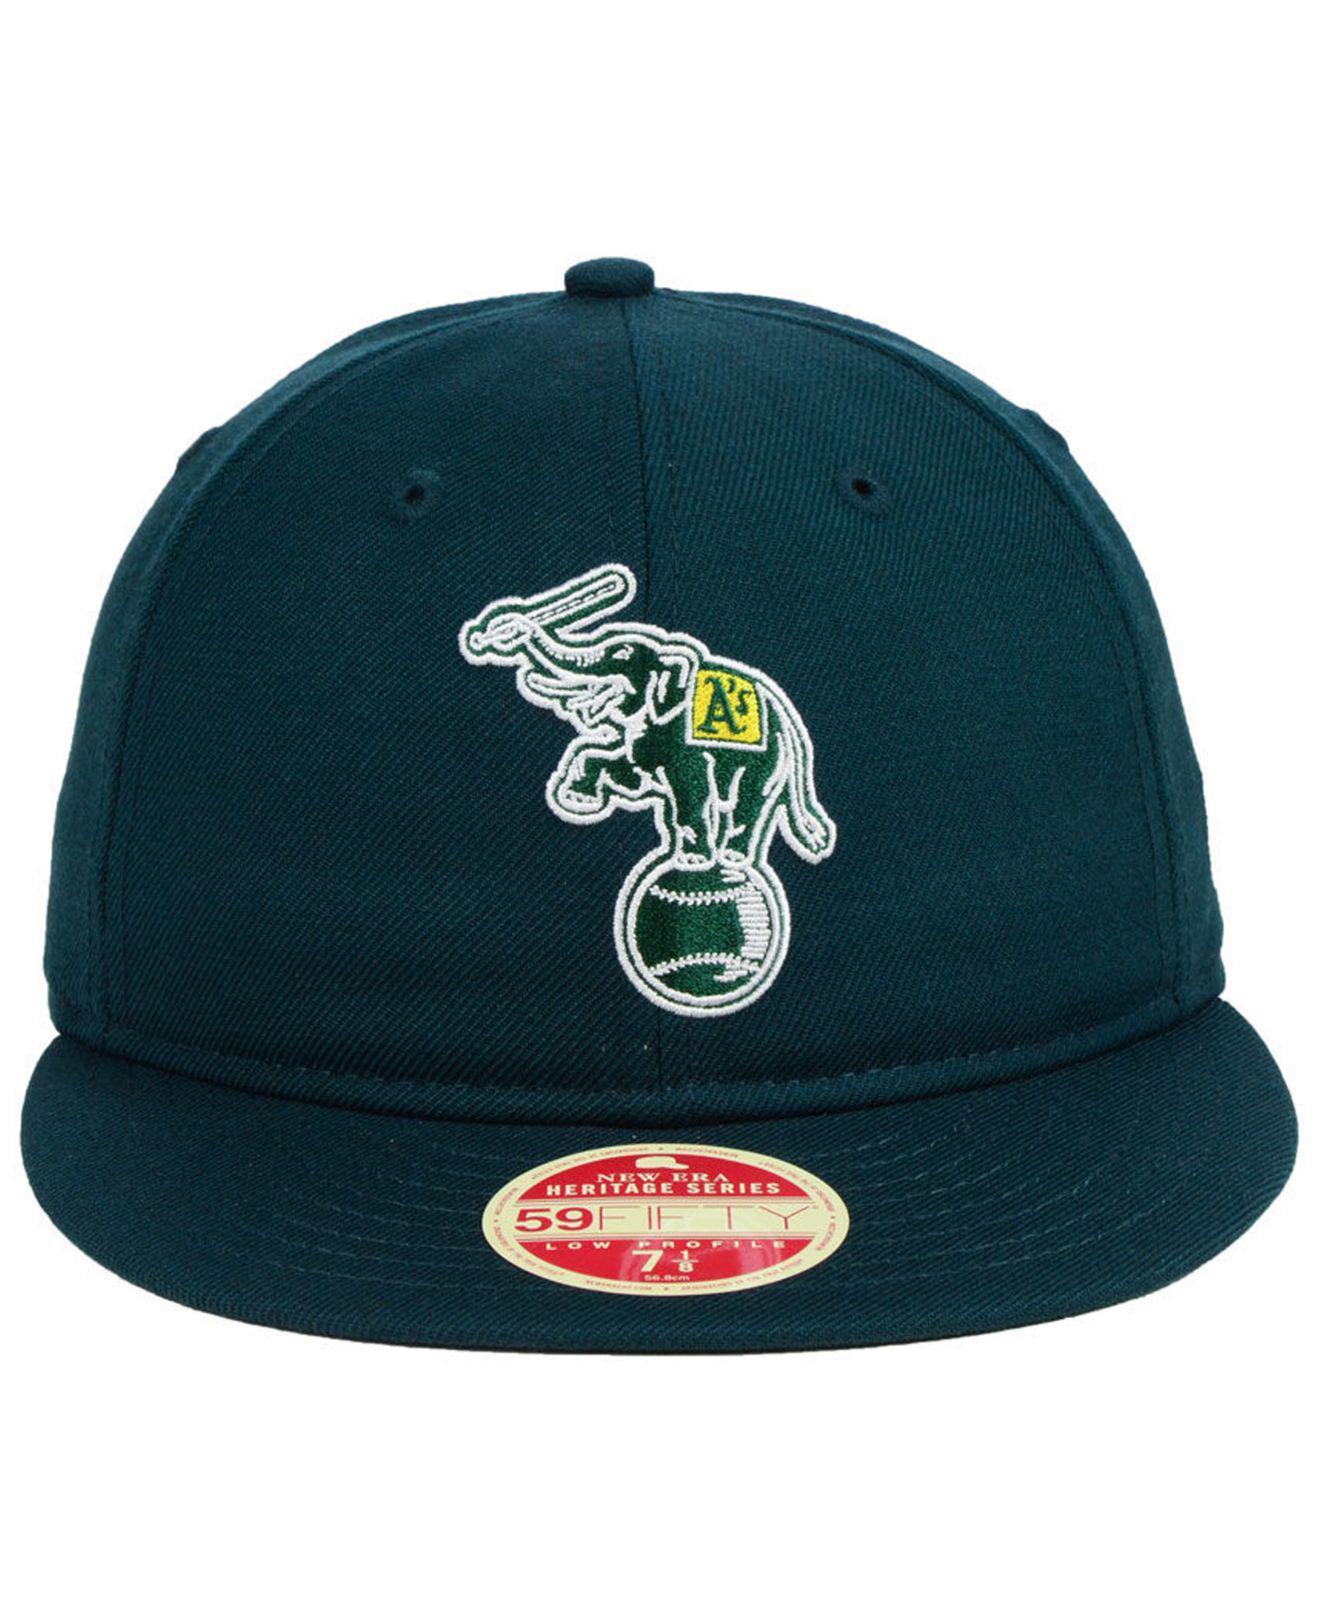 2e667e448 KTZ Green Oakland Athletics Heritage Retro Classic 59fifty Fitted Cap for  men